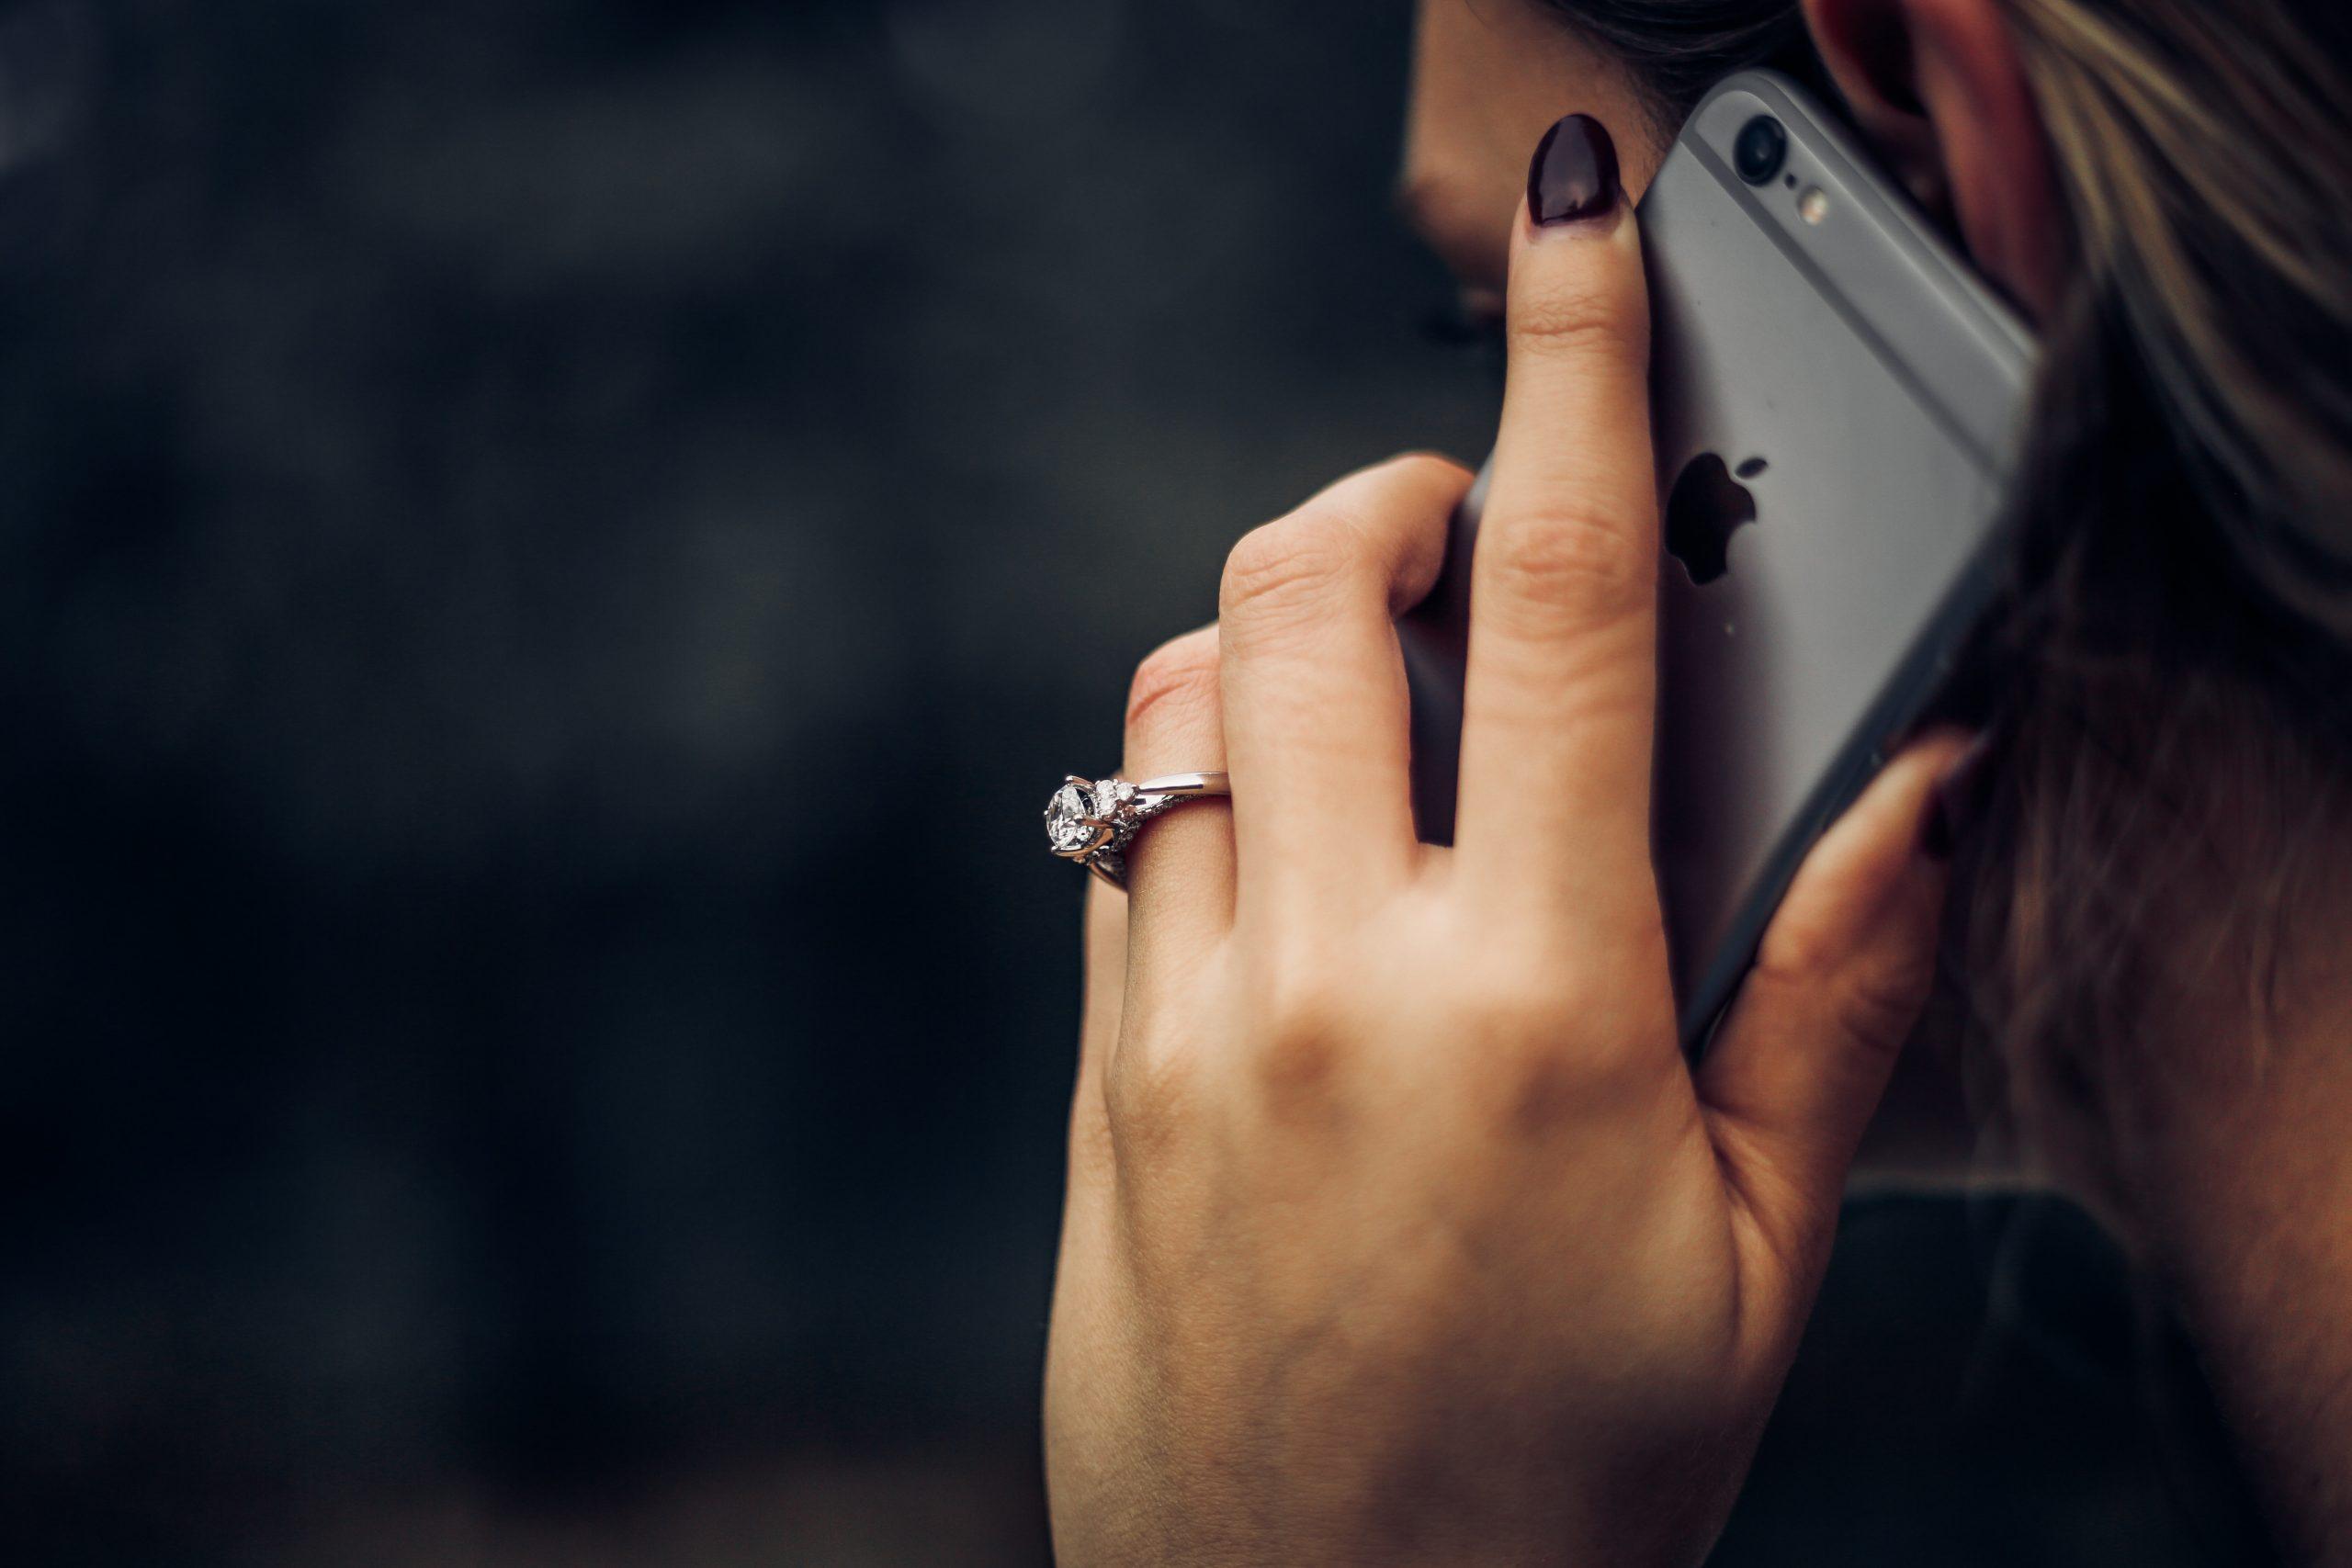 colloquio telefonico